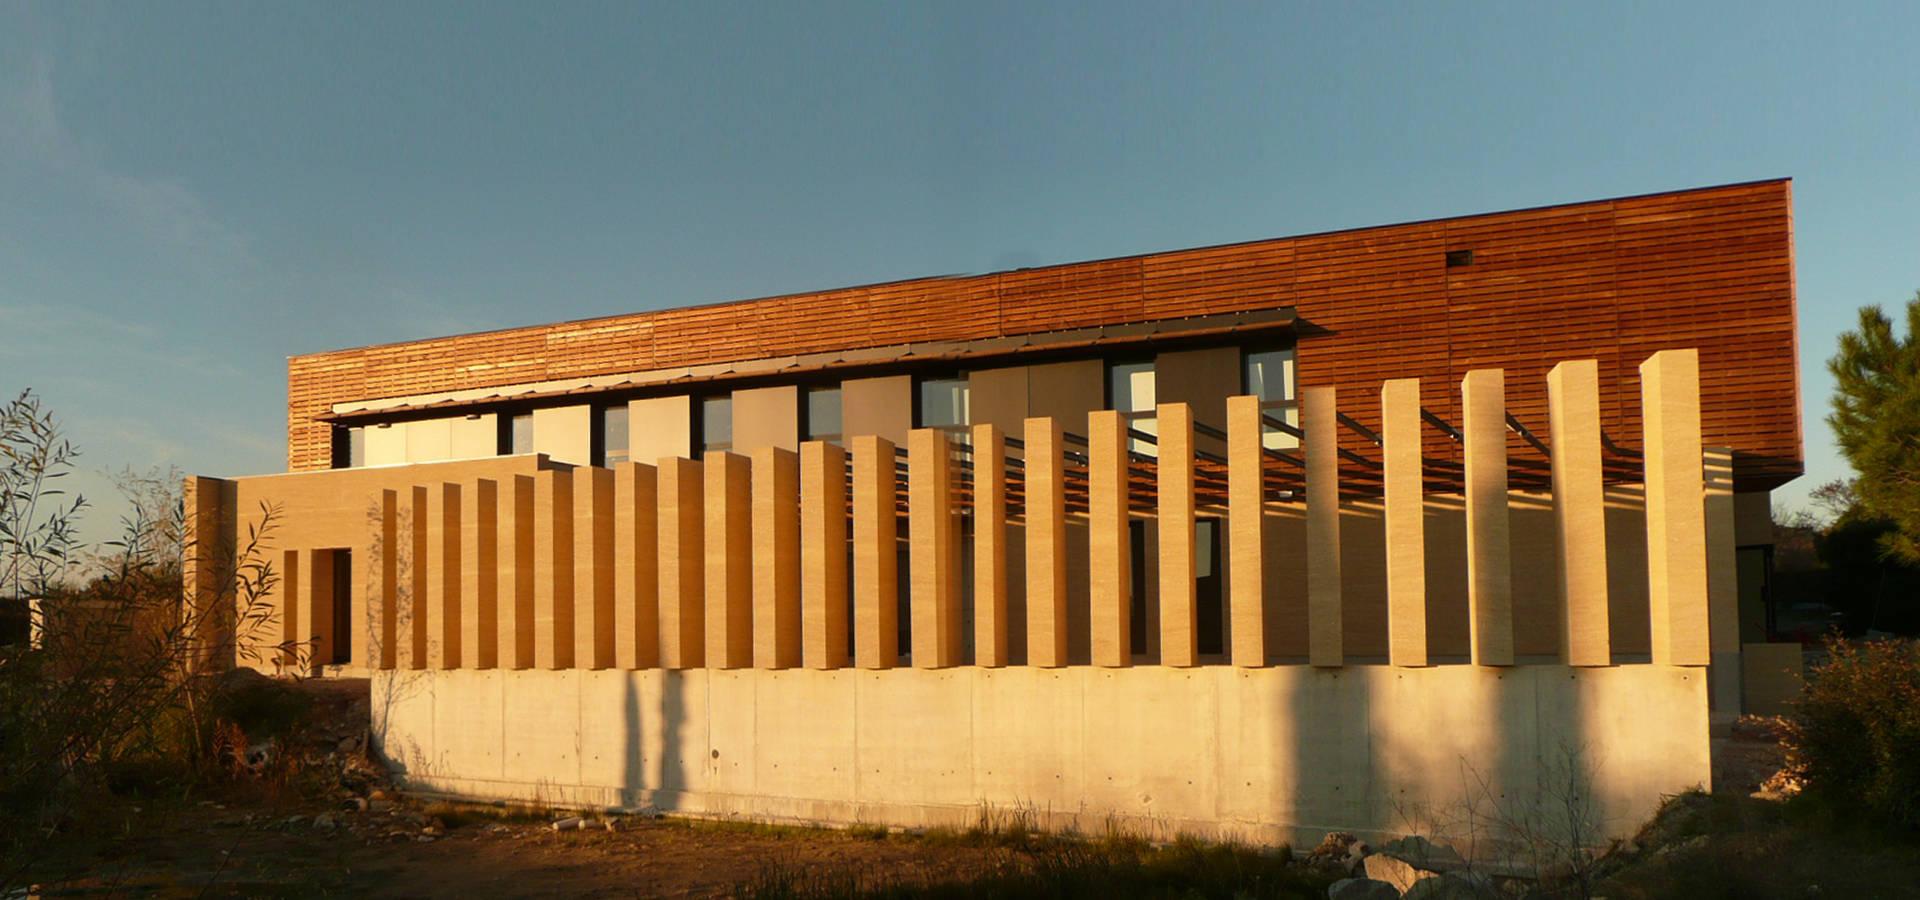 AGENCE D'ARCHITECTURE BRAYER-HUGON